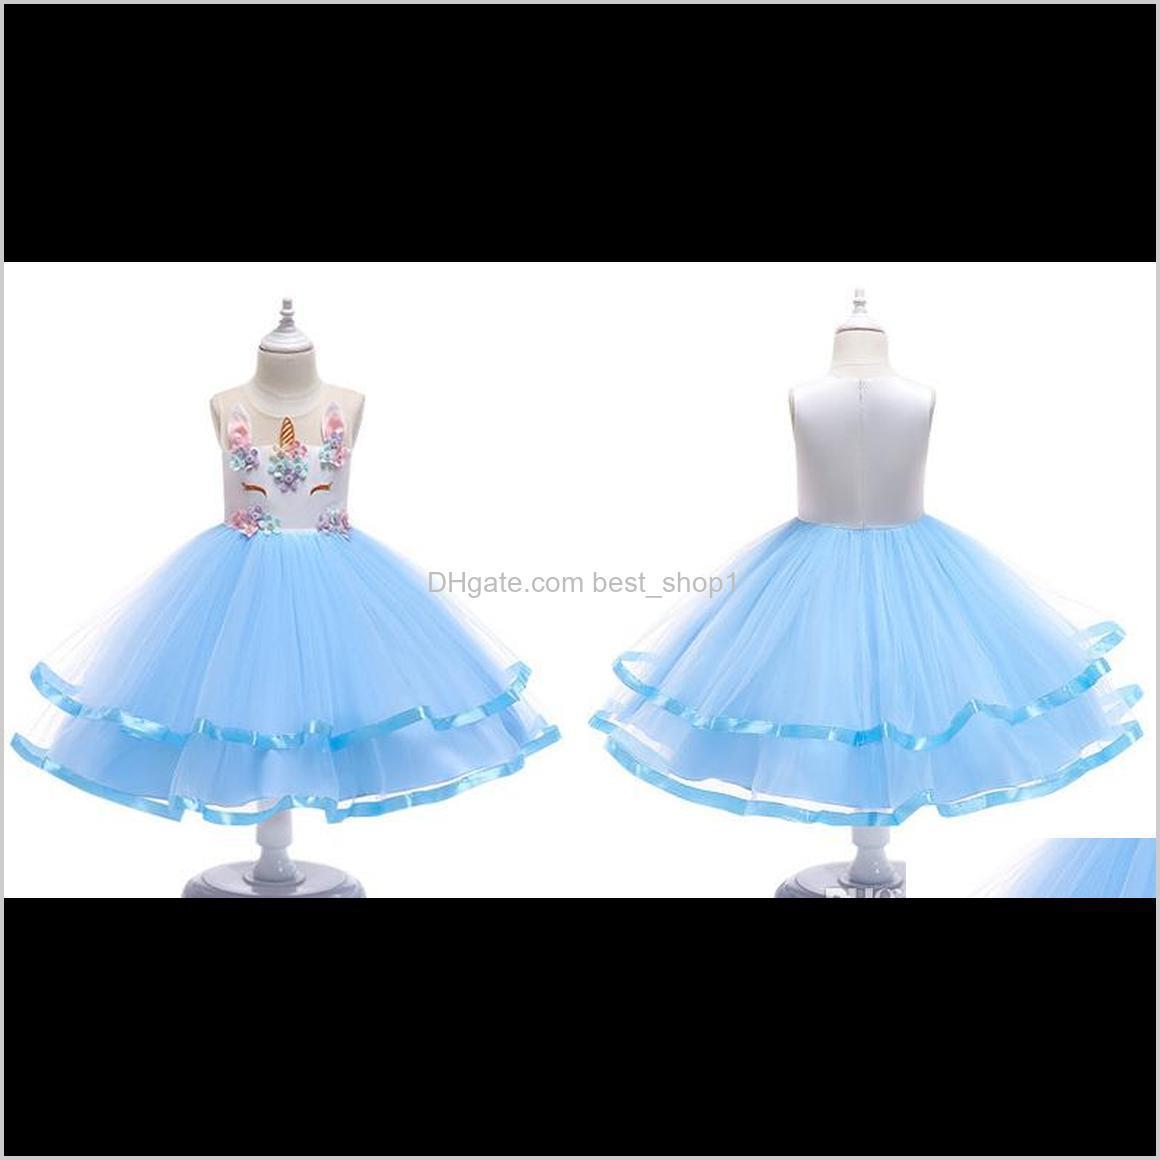 halloween baby girls unicorn cosplay dress embroidery flower children ballgown kids costume tutu skirts fast shipping